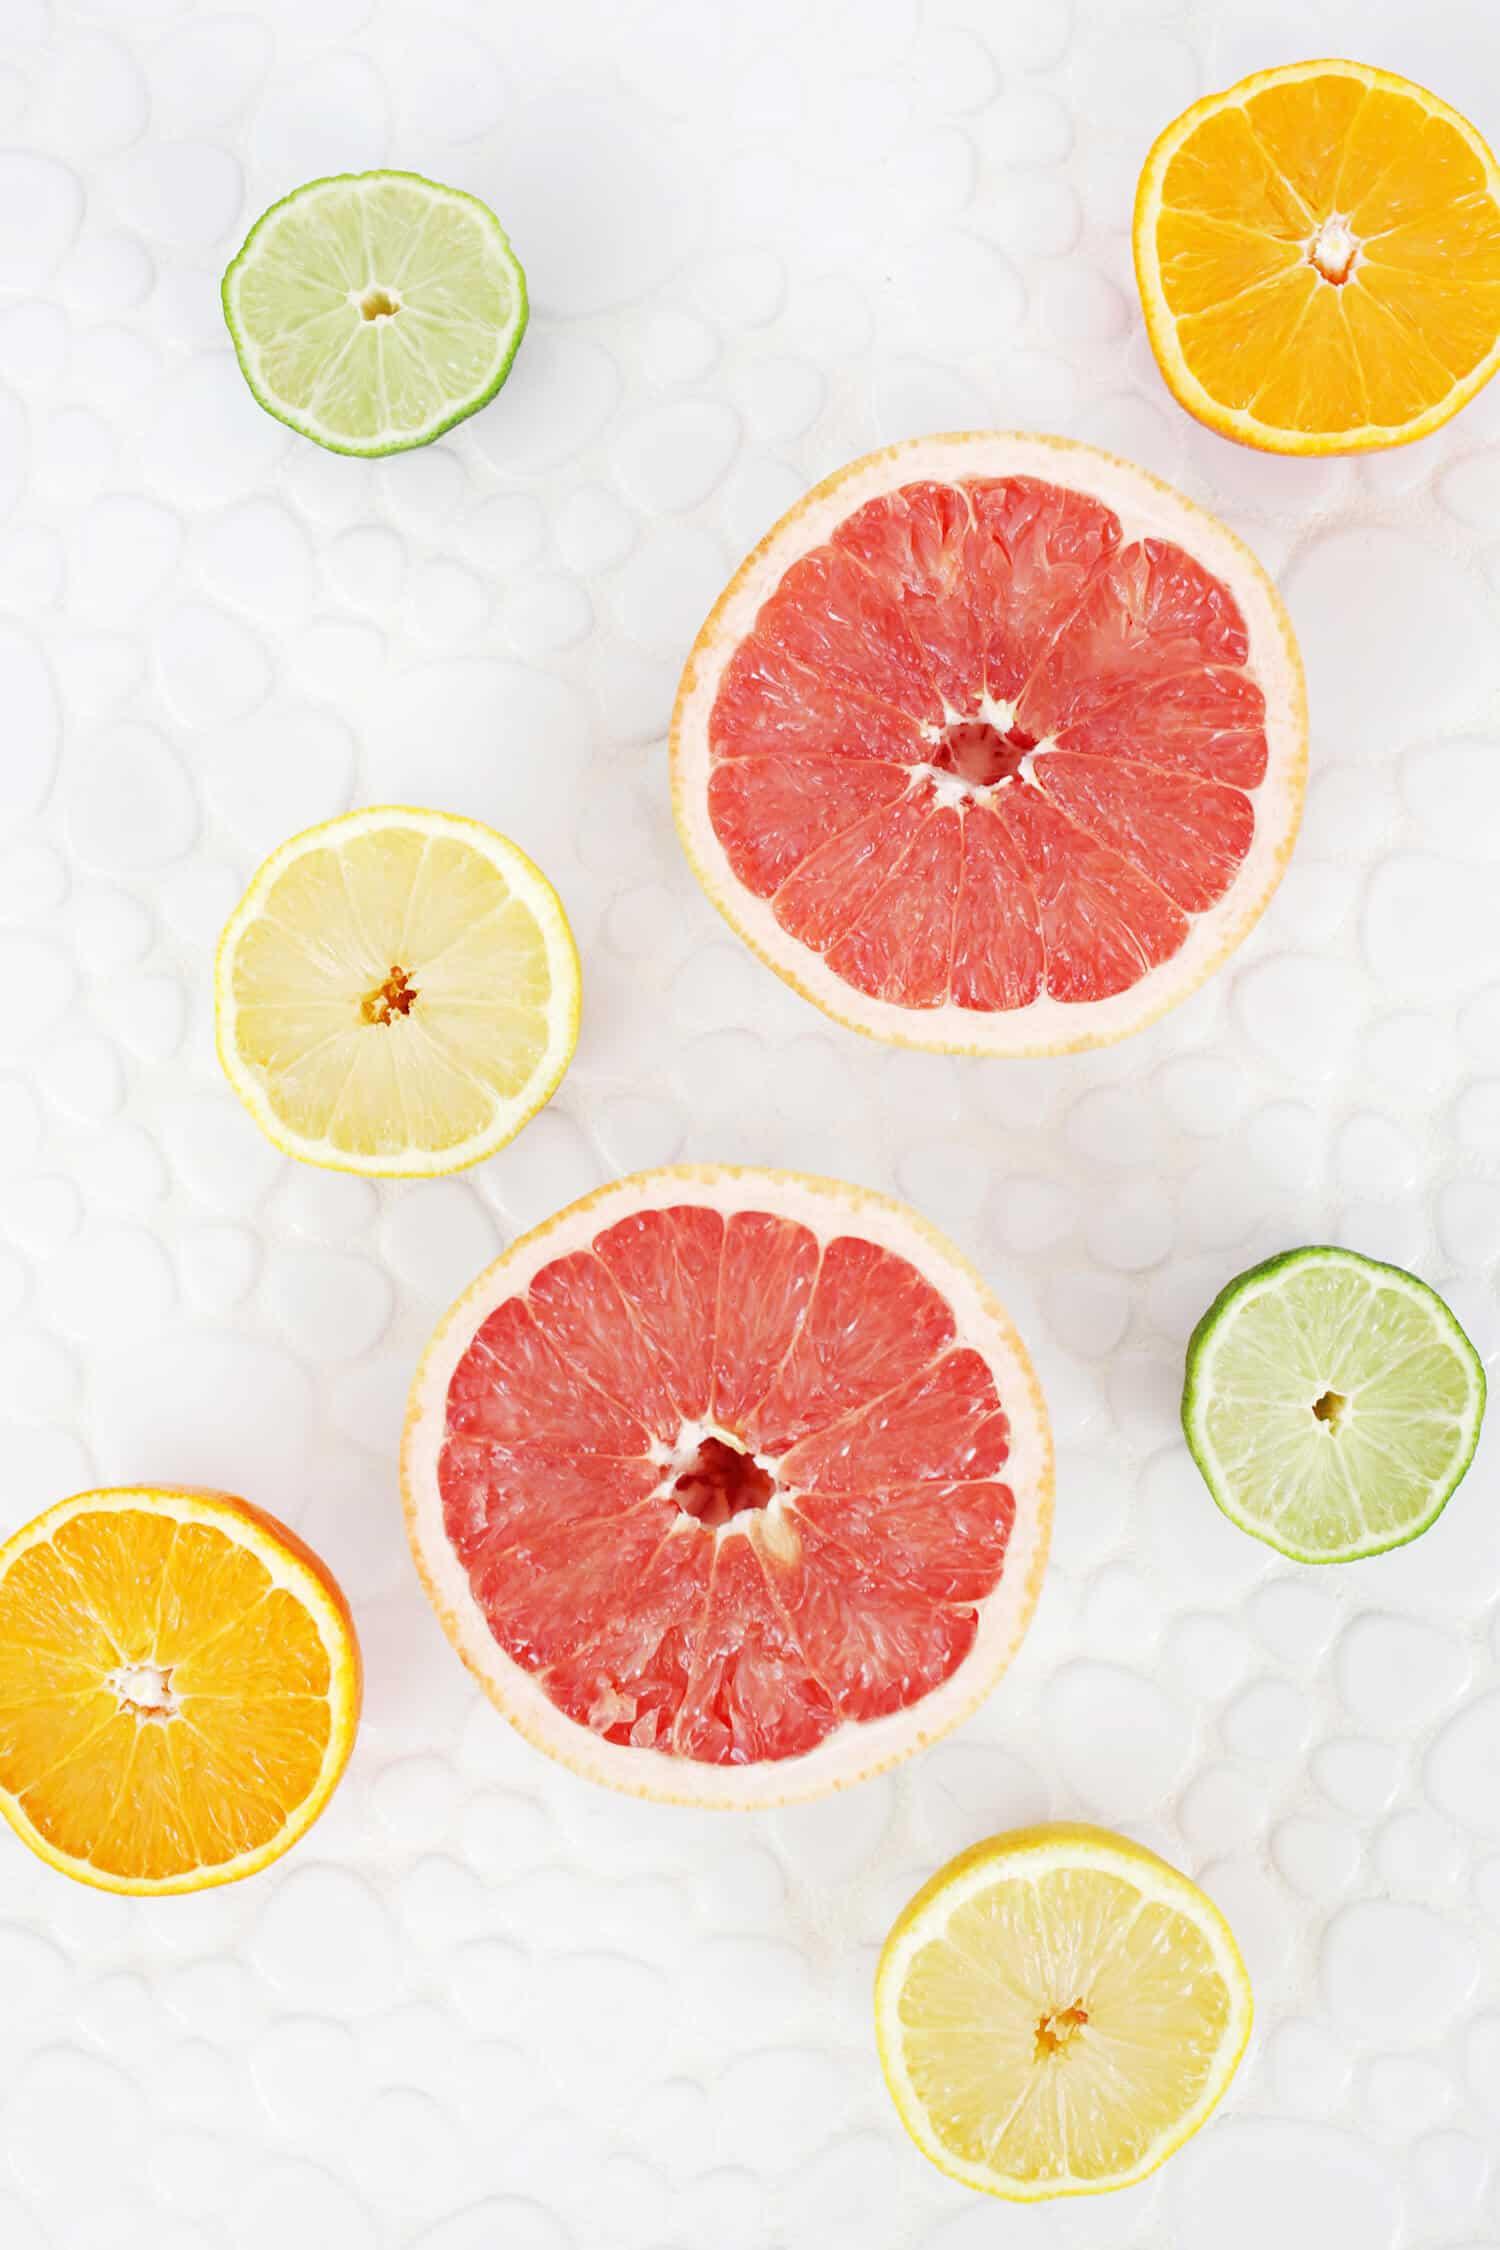 Citrus + Himalayasalz Diffusor 4 Wege!